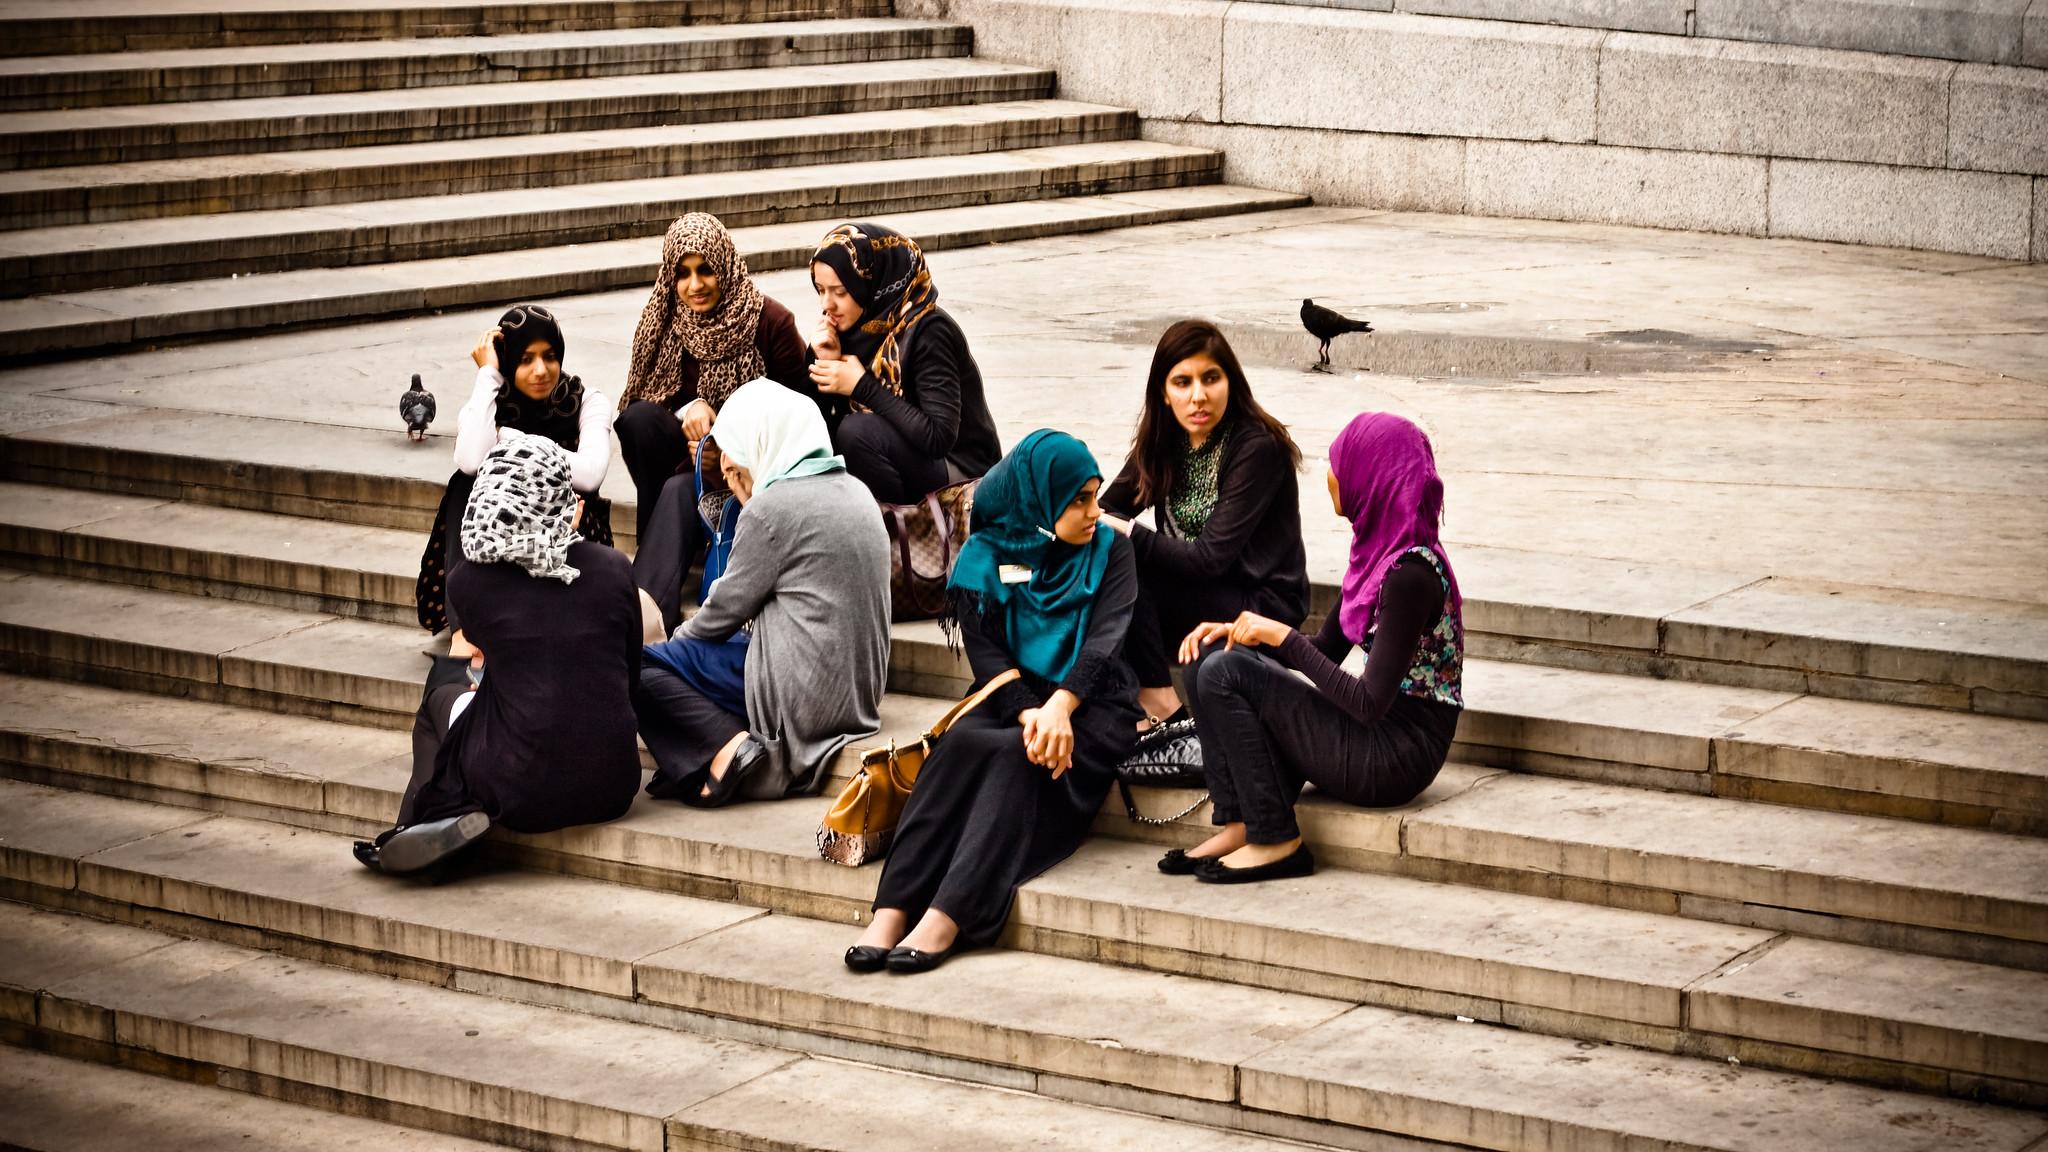 New satellite TV program reaches women in Iran with the Gospel